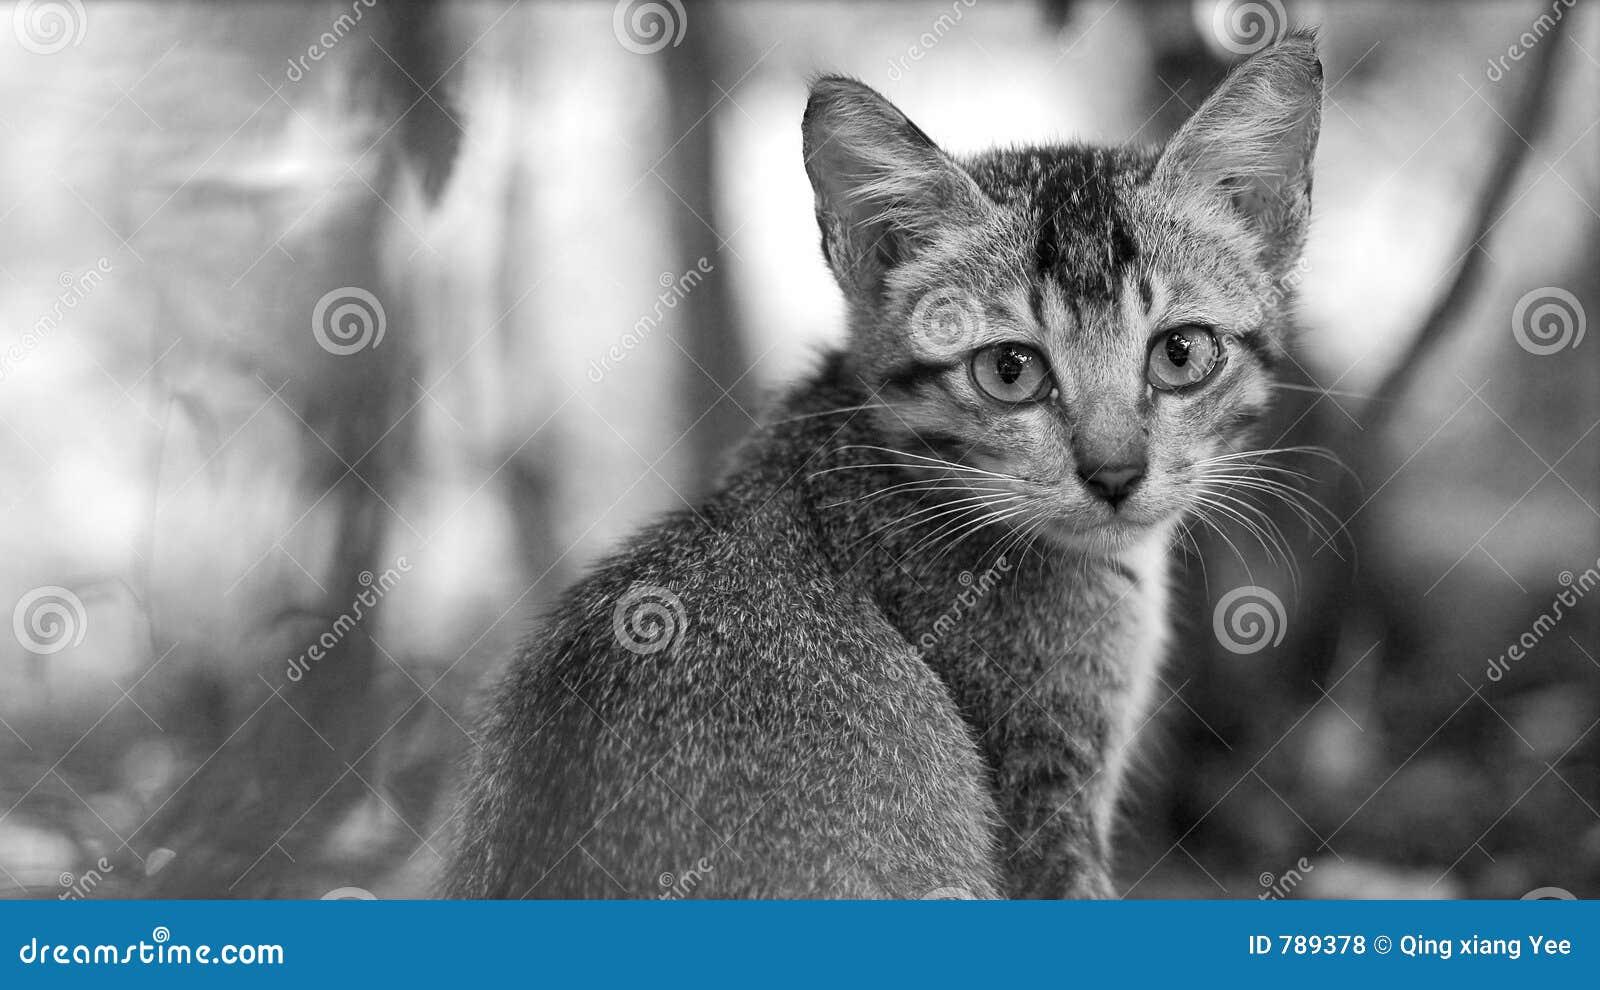 cat kitten photo sad eyes stock photo image 789378